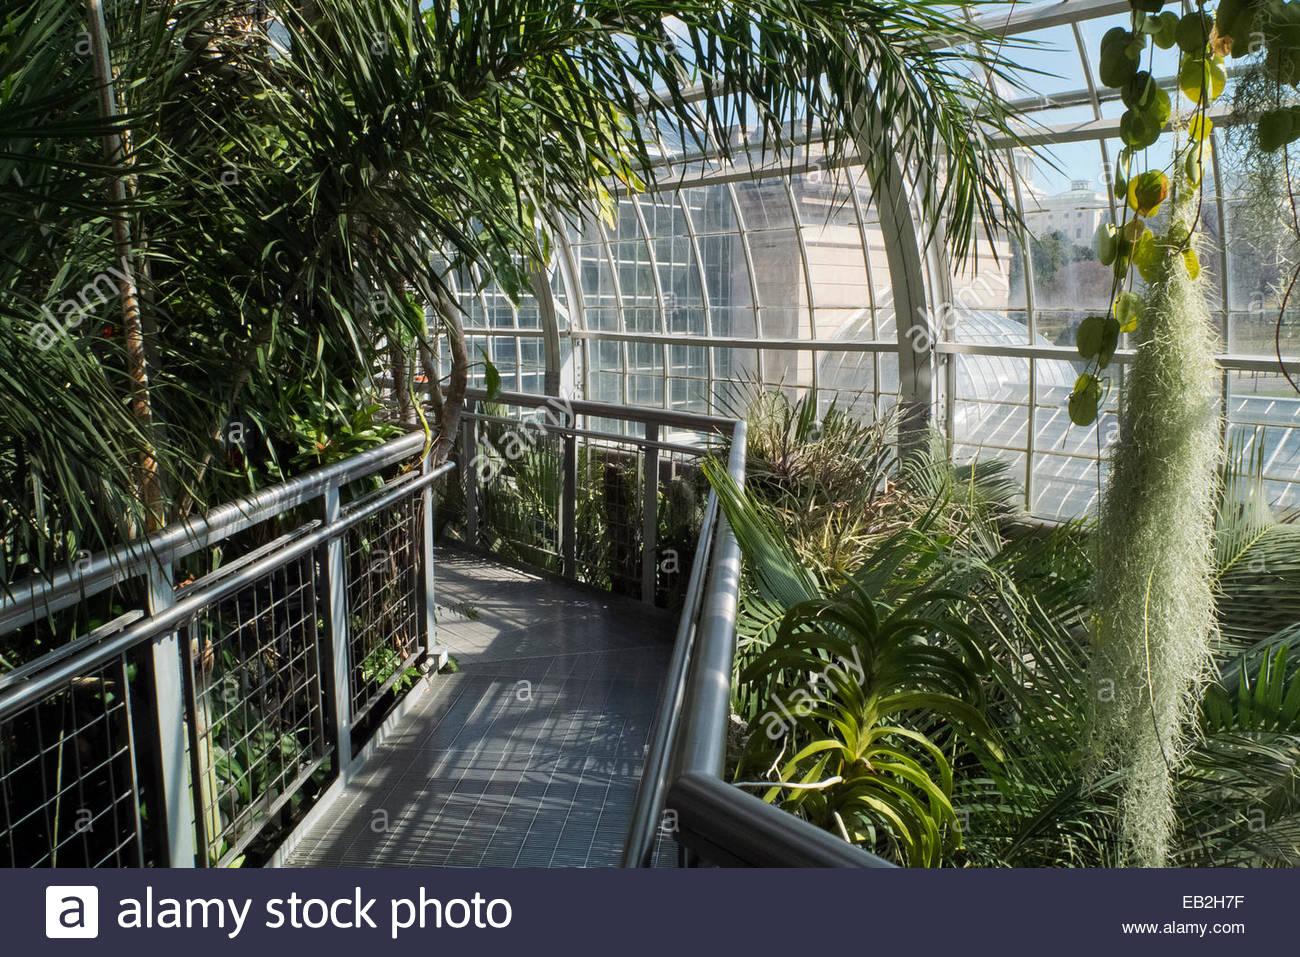 inside the us botanical garden in washington, dc stock photo